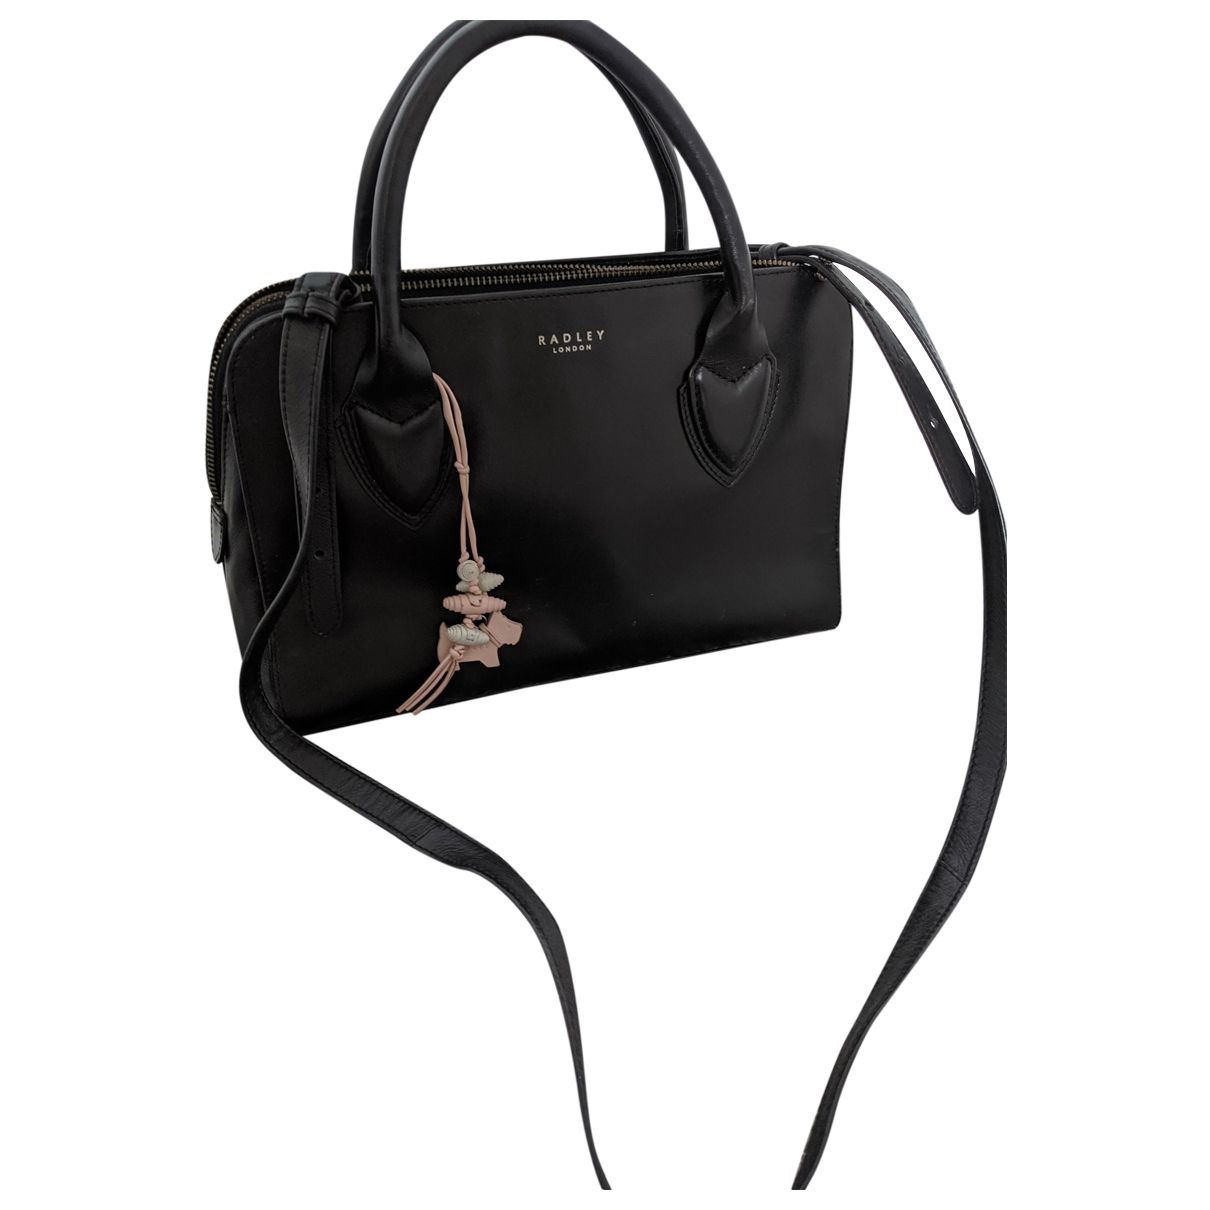 Radley London \N Black Leather handbag for Women \N